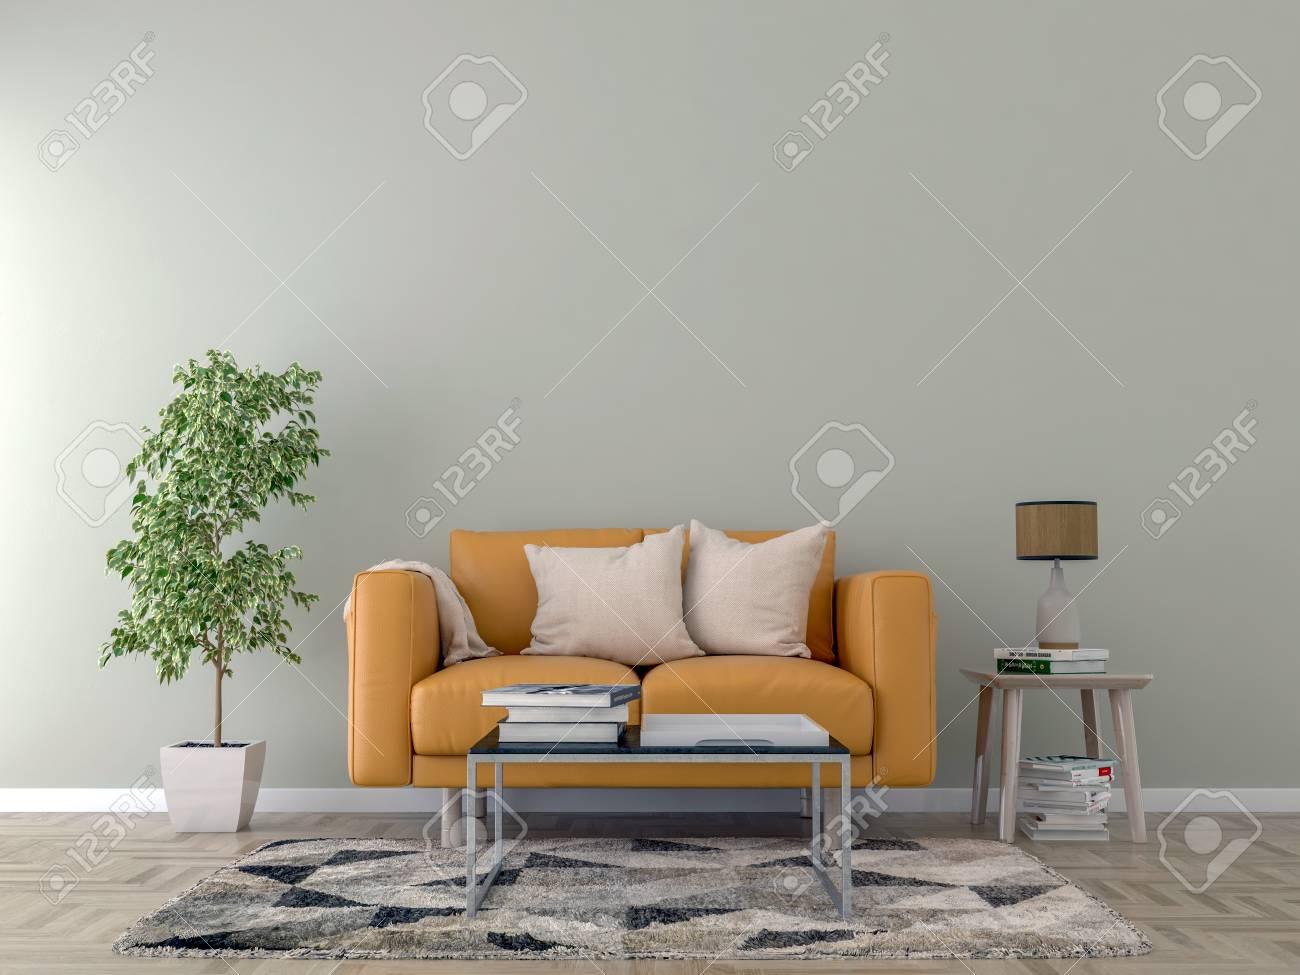 Living room interior with orange sofa, pillows, white plaid and..